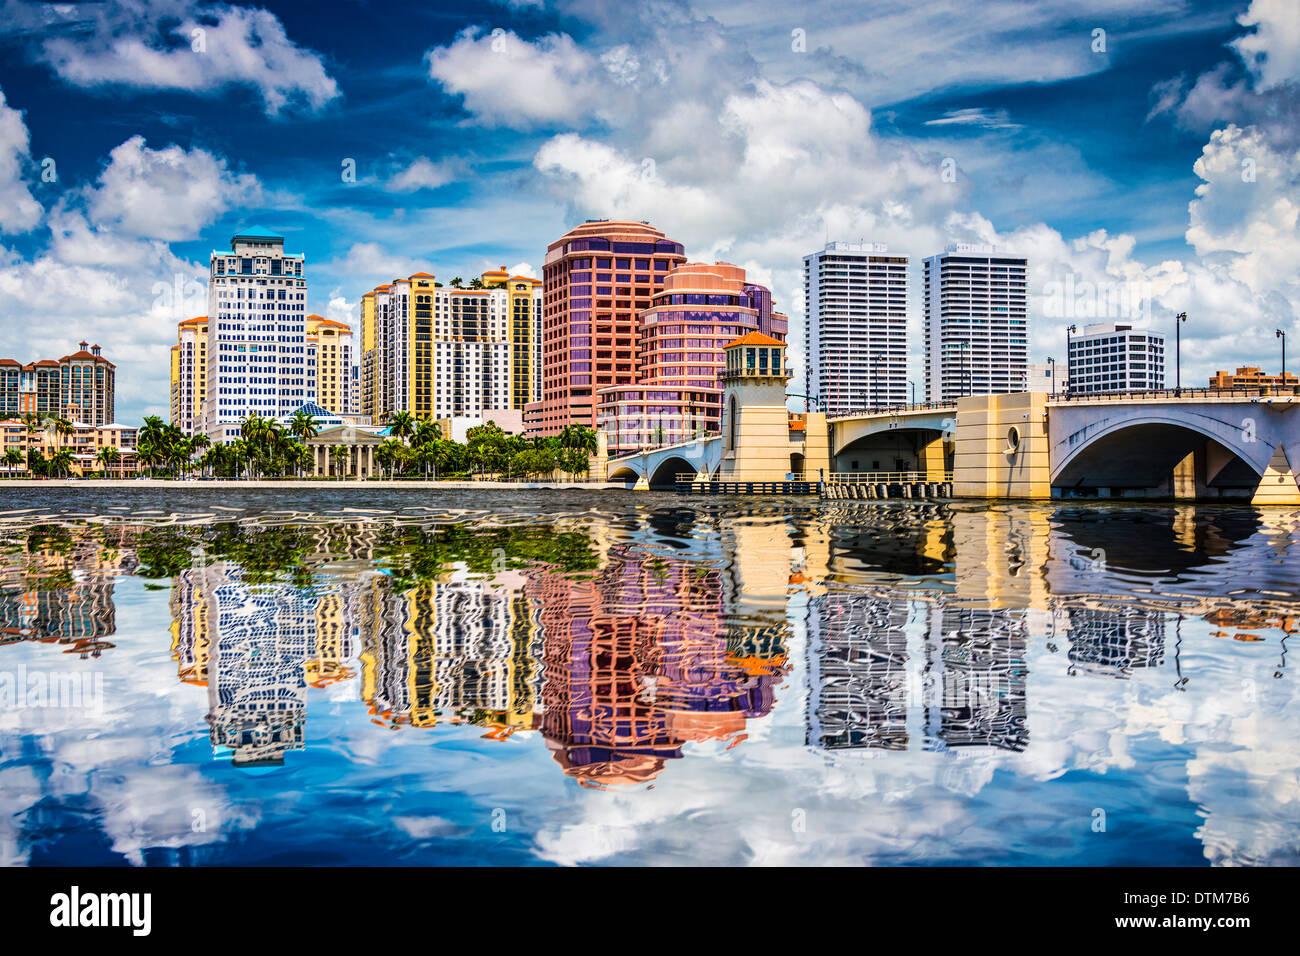 West Palm Beach, Florida, Stati Uniti d'America downtown sulla Intracoastal Waterway. Immagini Stock